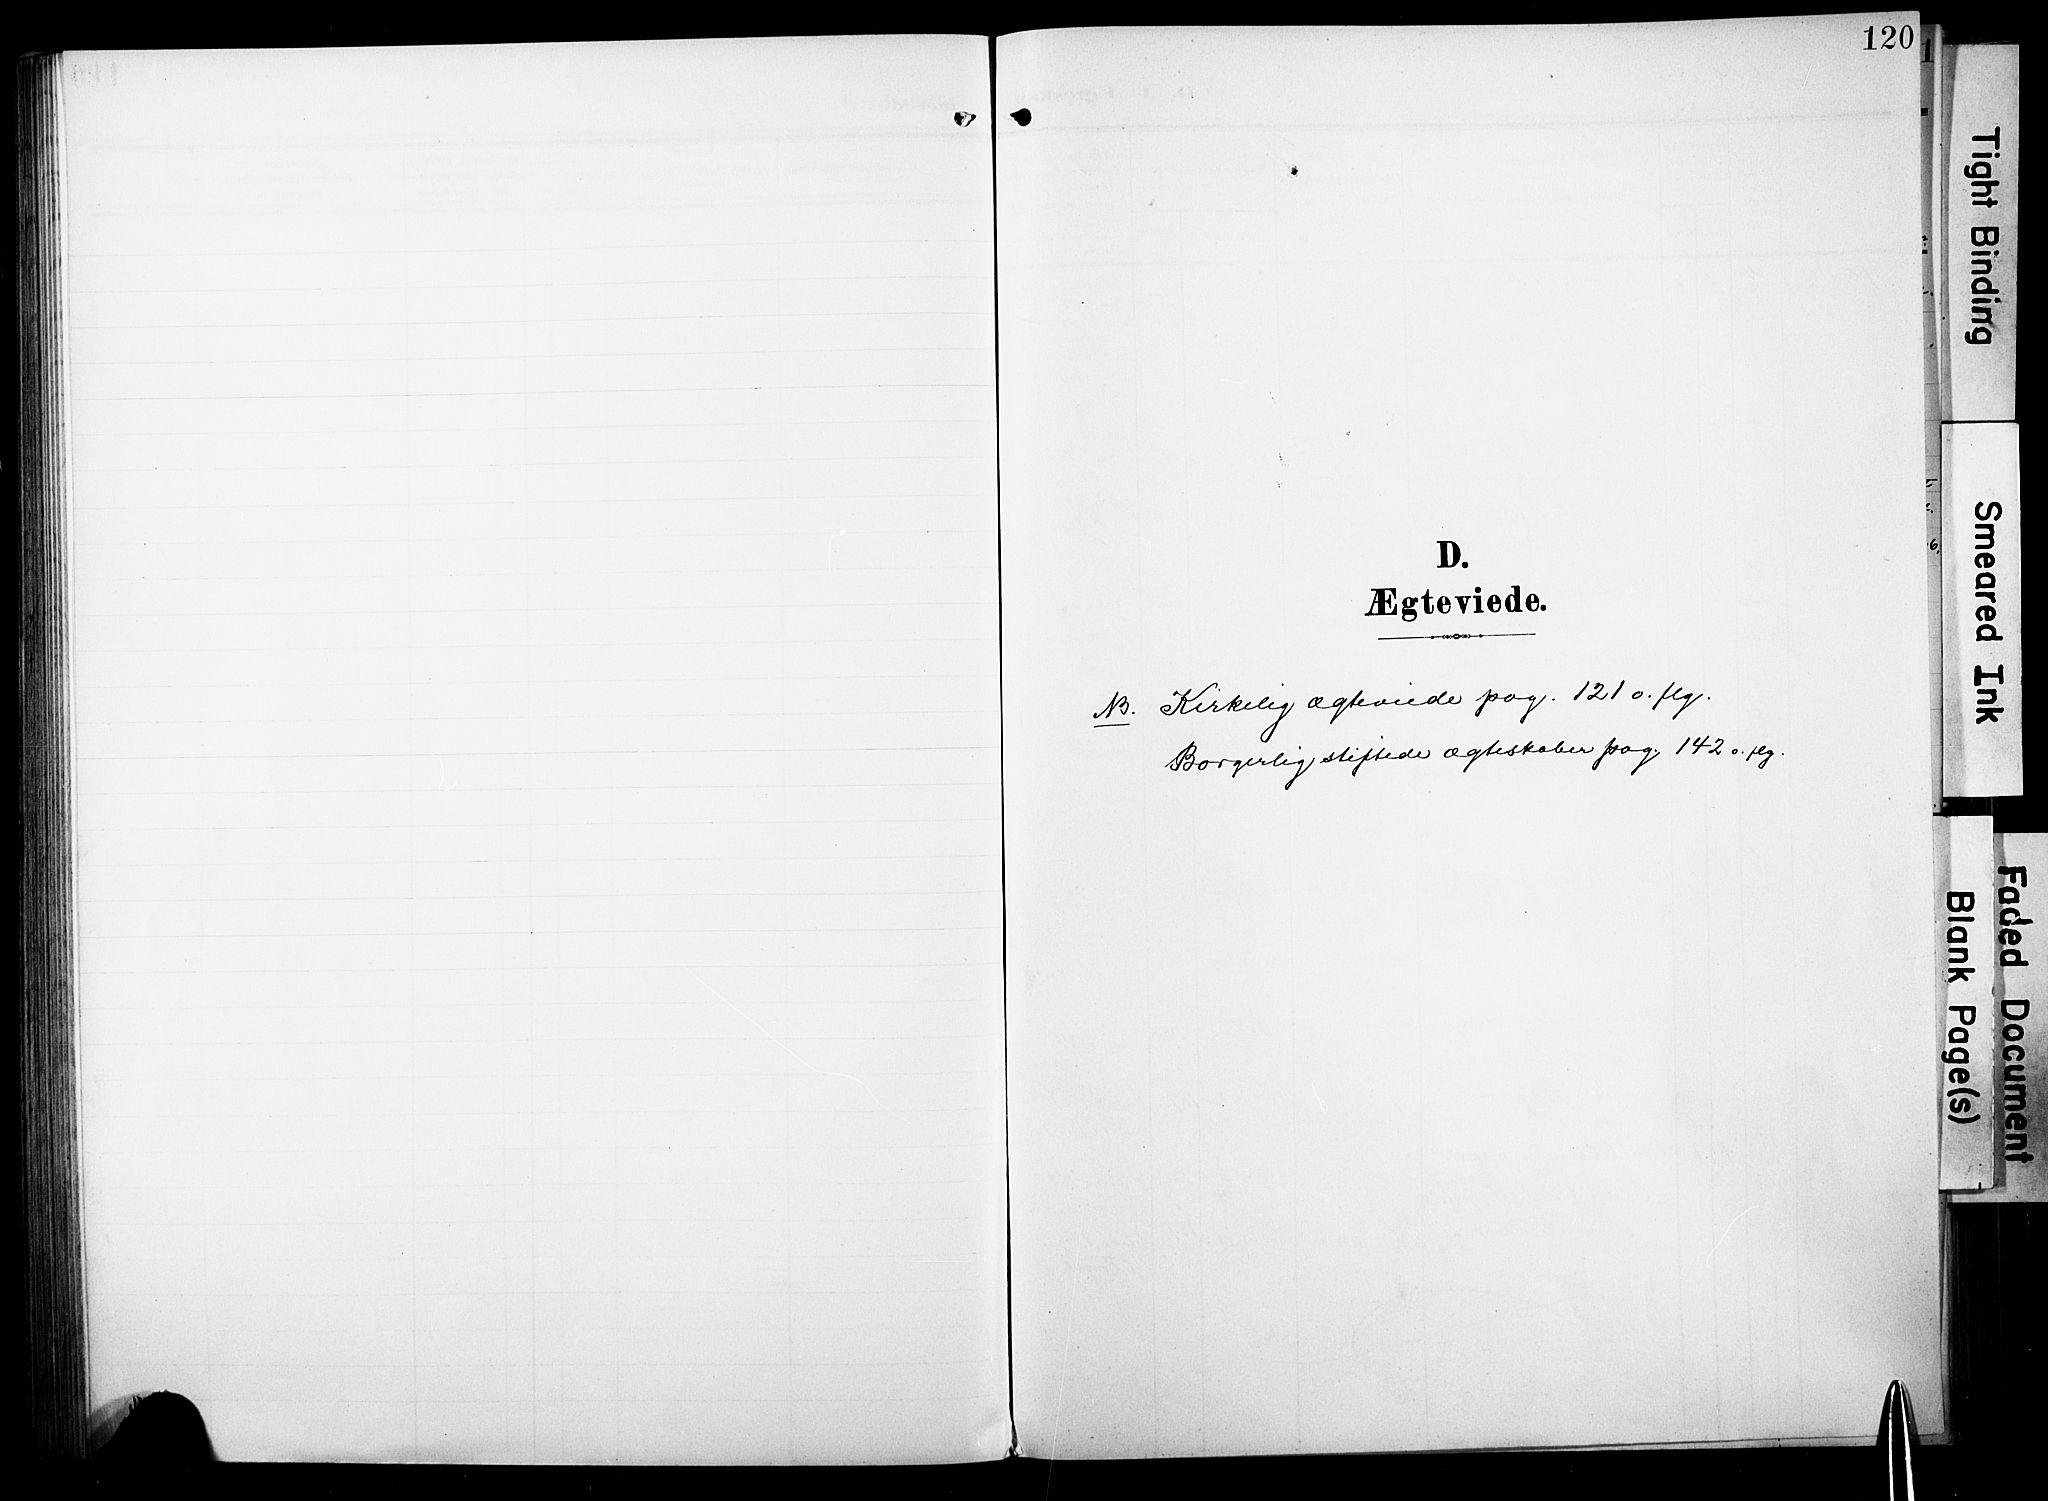 SAKO, Fiskum kirkebøker, F/Fa/L0004: Ministerialbok nr. 4, 1906-1924, s. 120